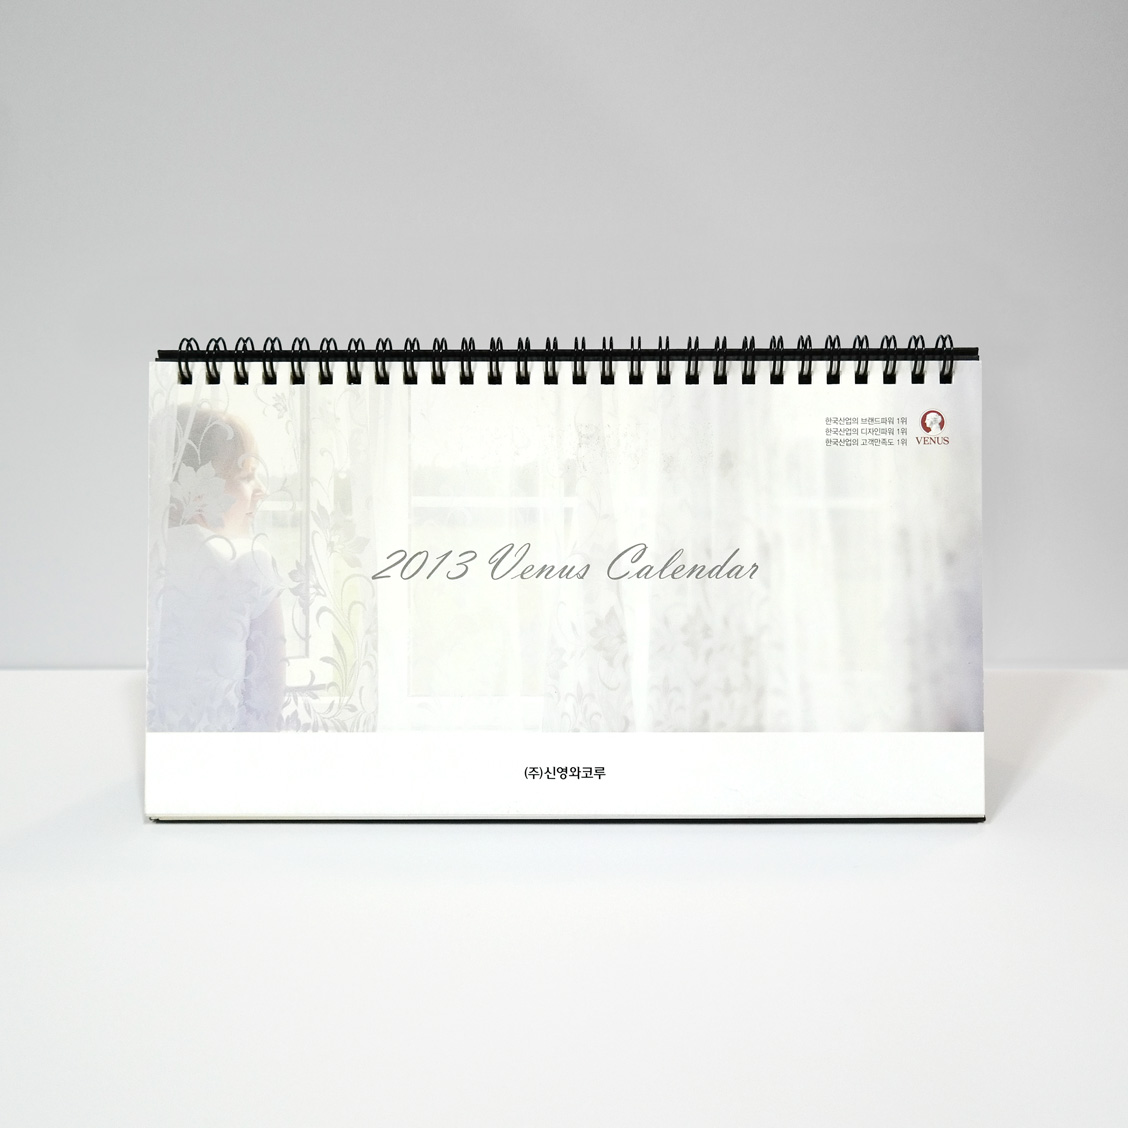 Venus Calendar 2013